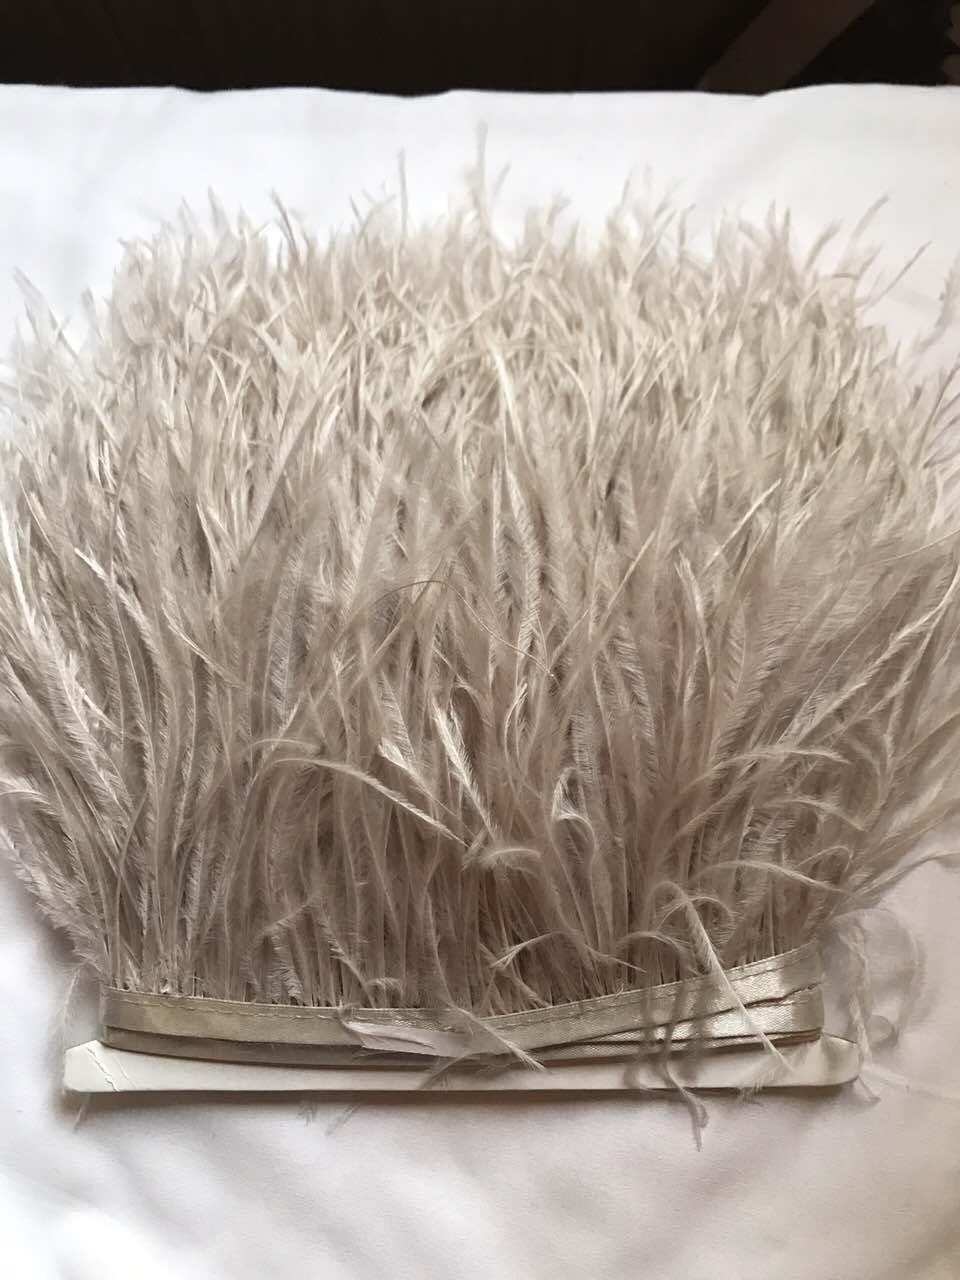 Перьевая тесьма из перьев страуса .Цвет светло серый.Цена за 0,5м